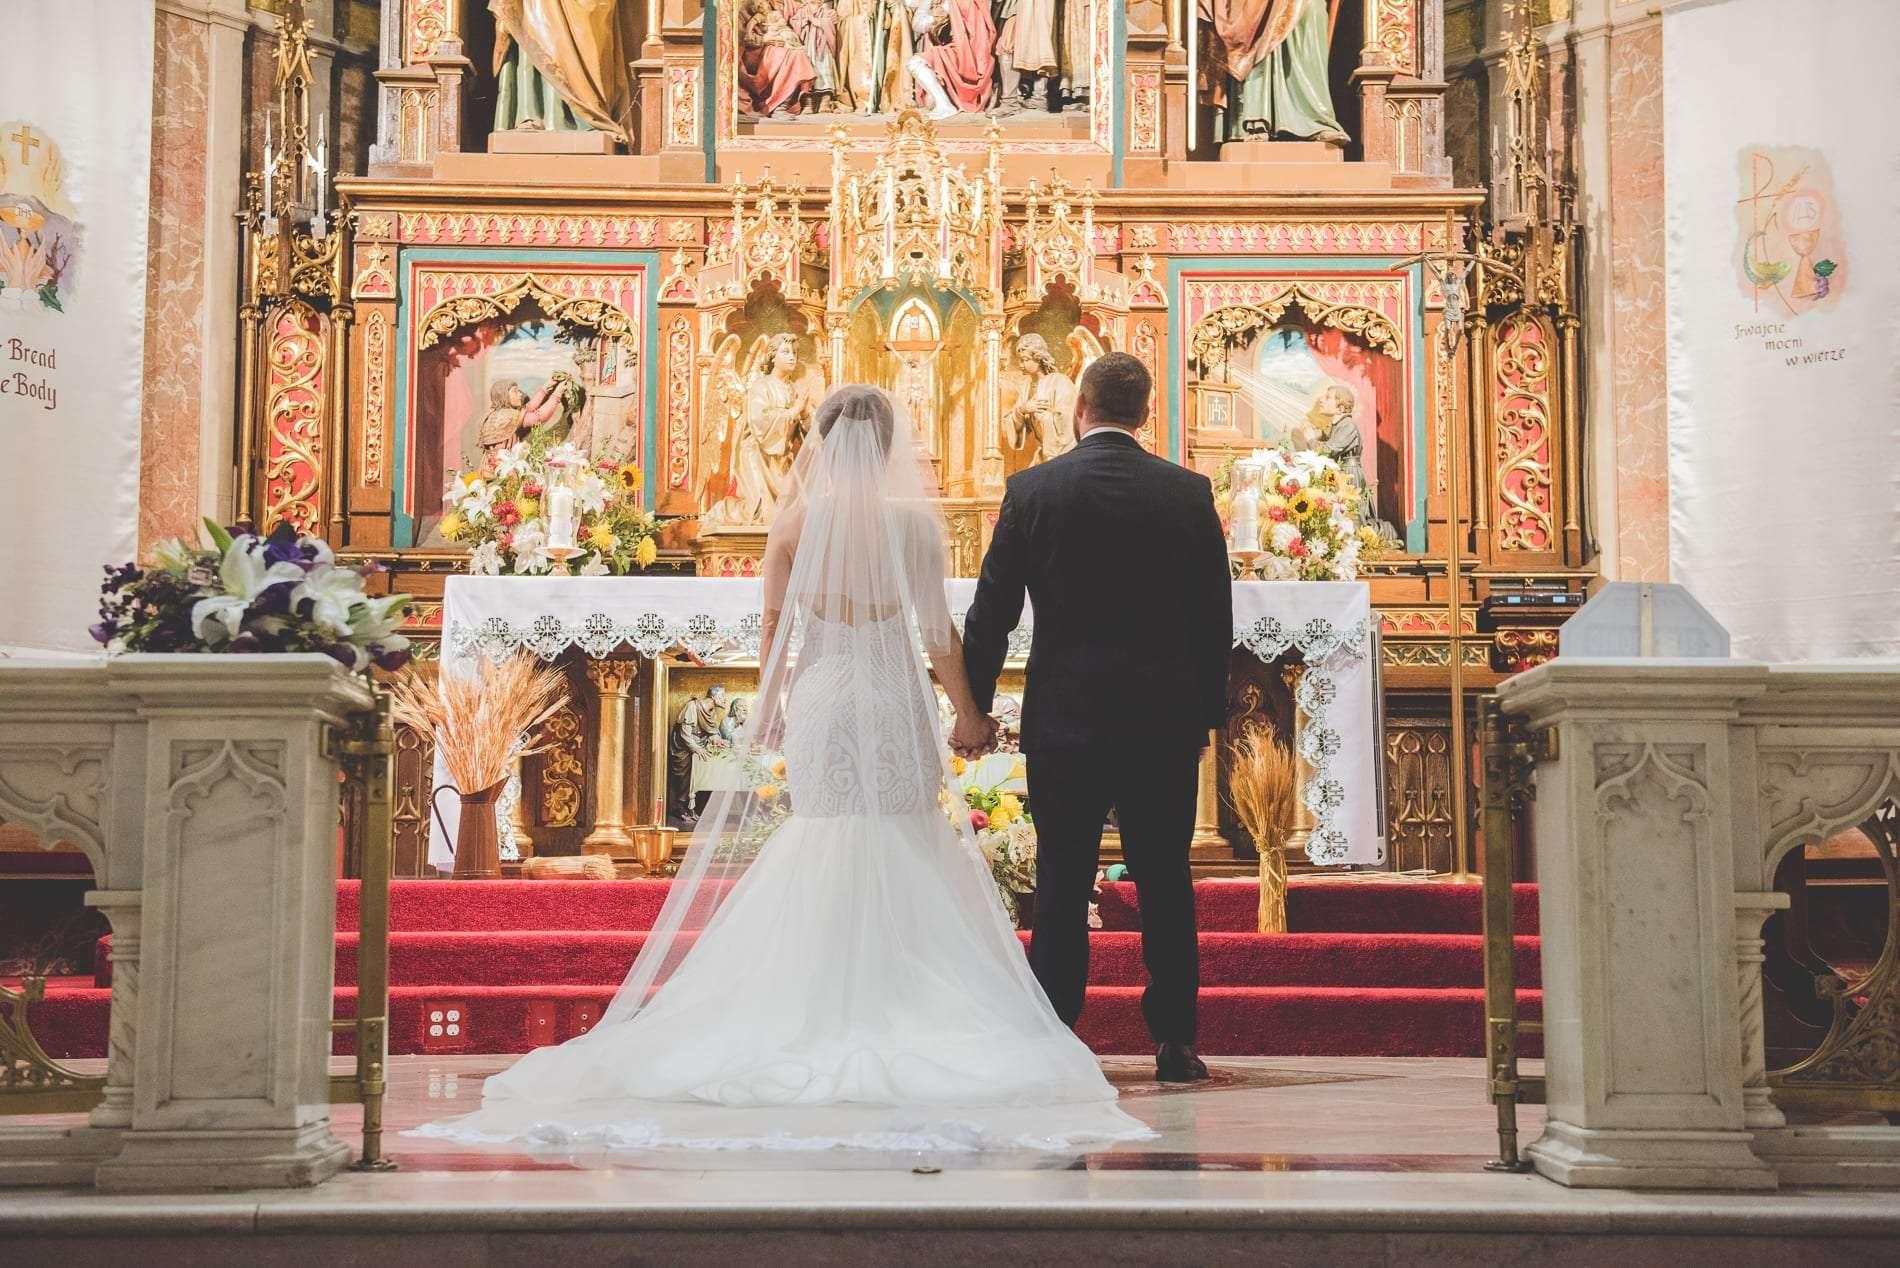 St. Alderberts wedding ceremony